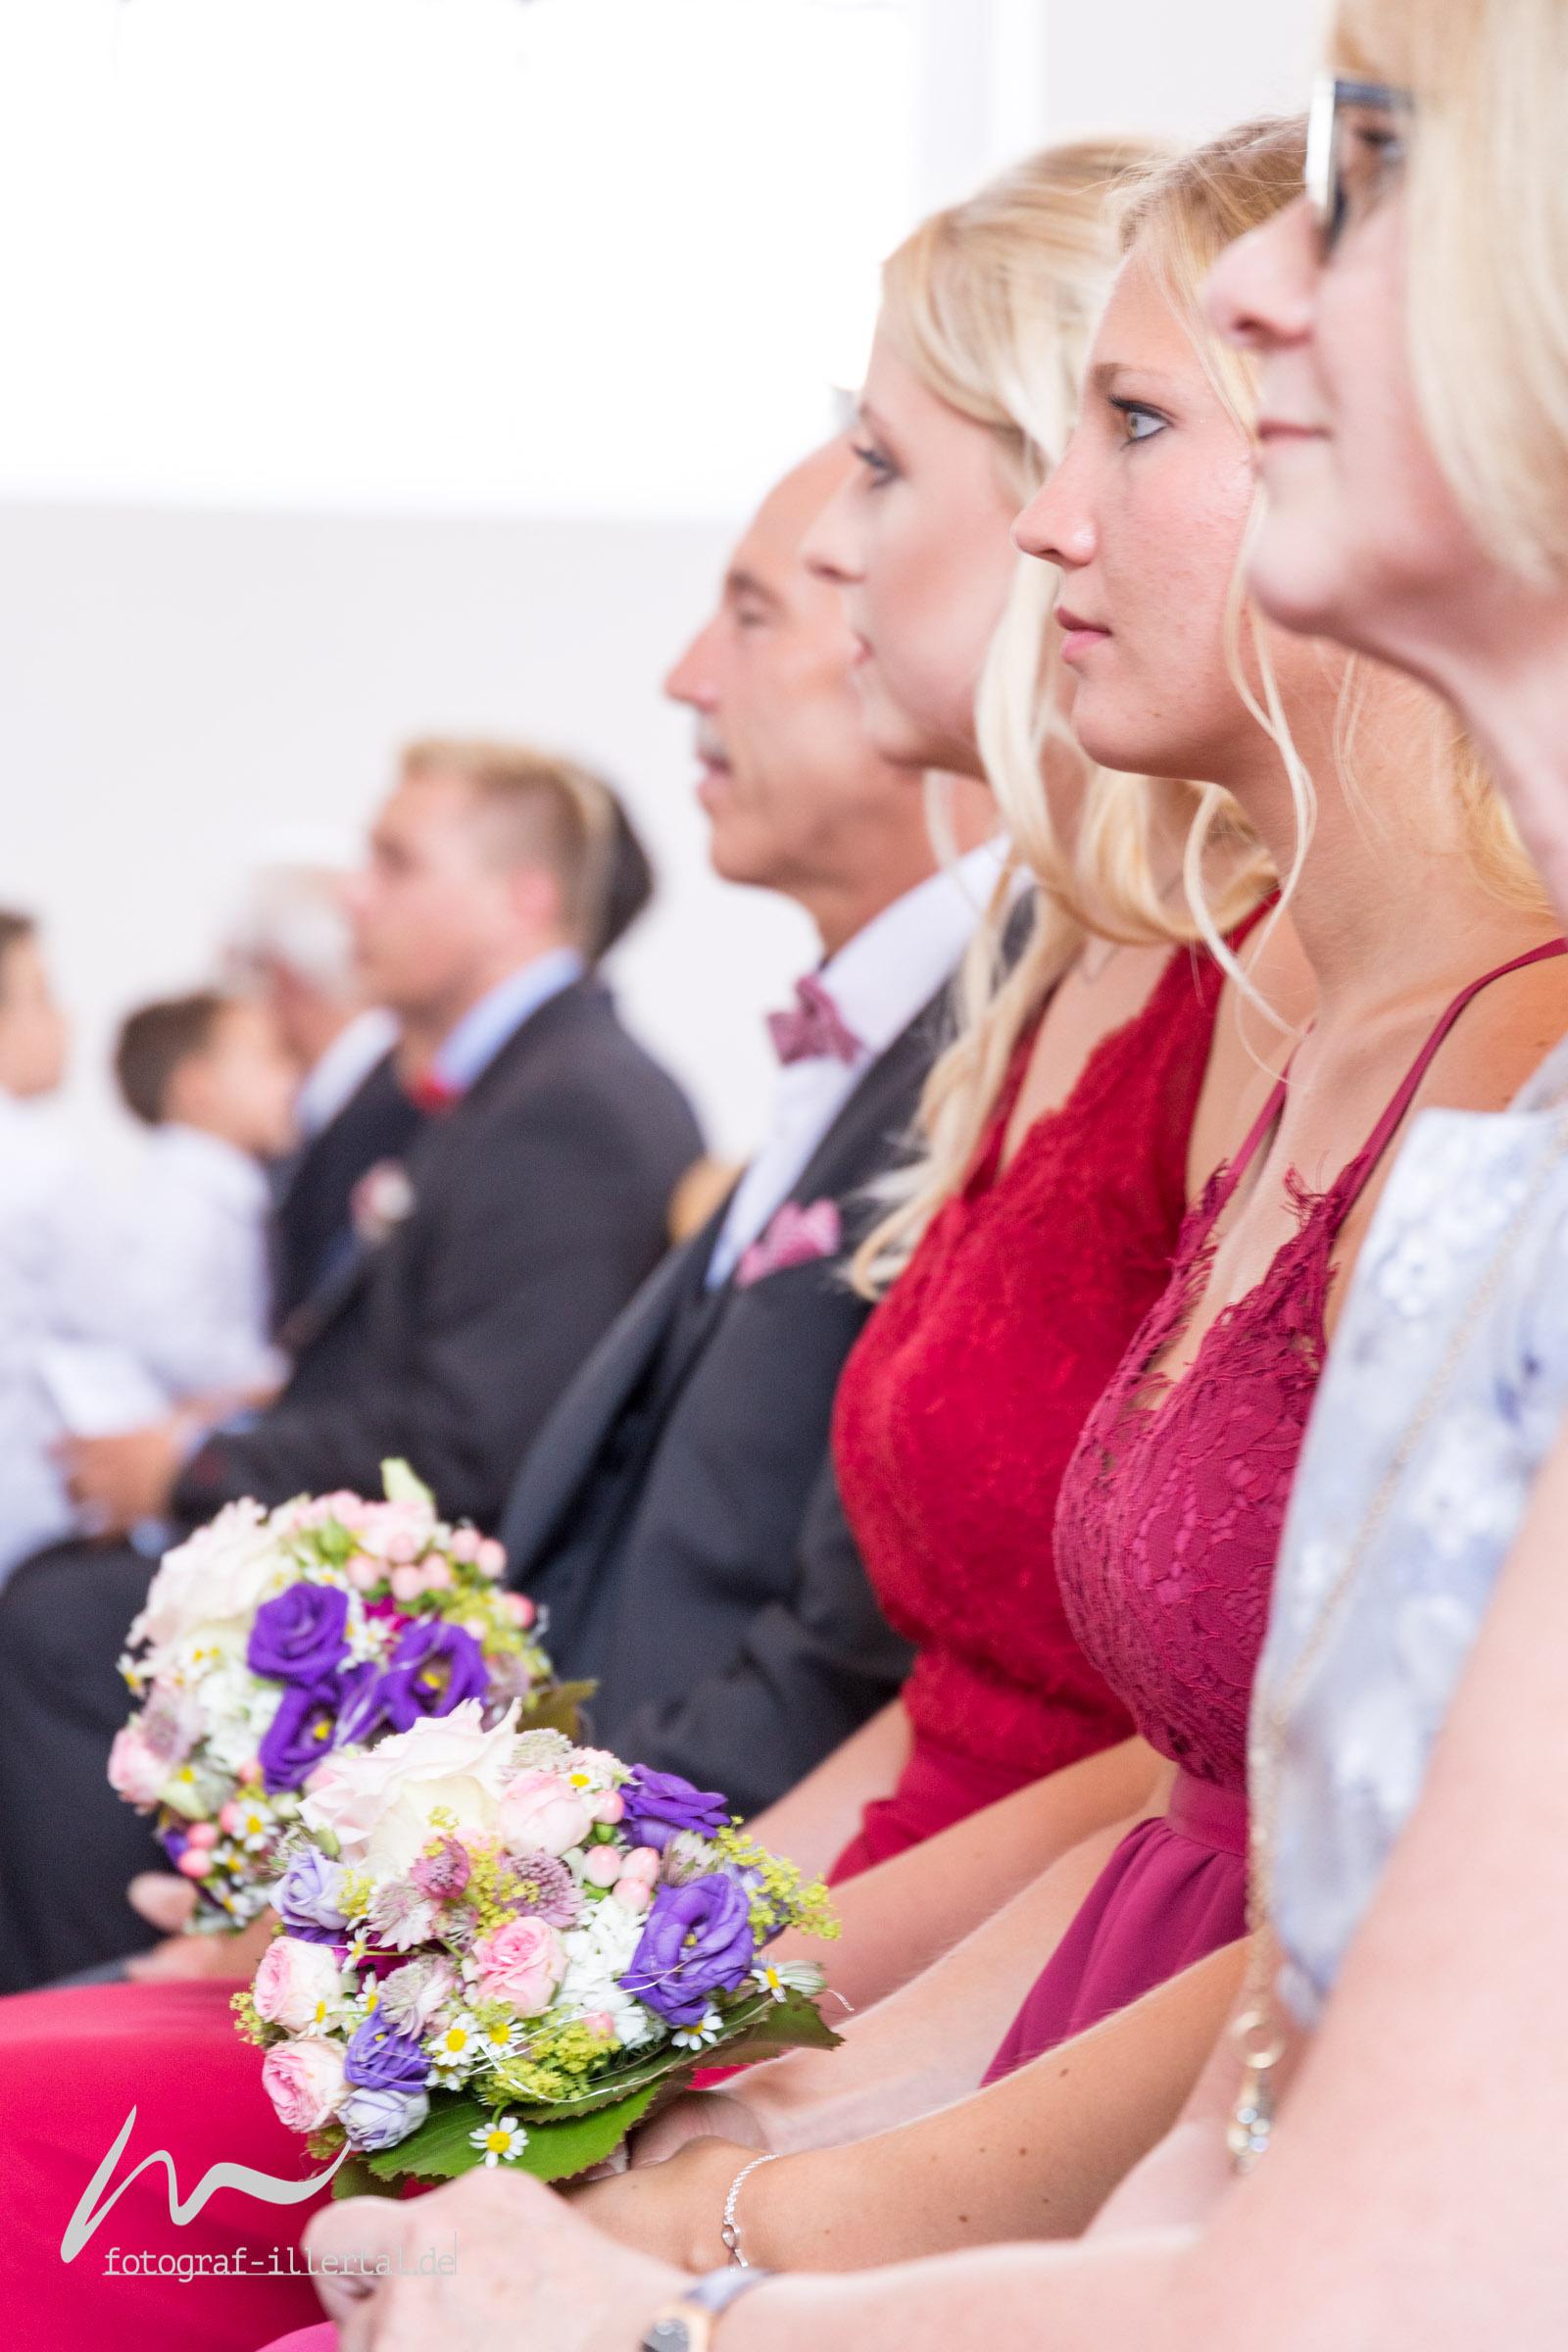 Fotograf Illertal-Christian Miller-Hochzeitsfotografie-_MG_2138